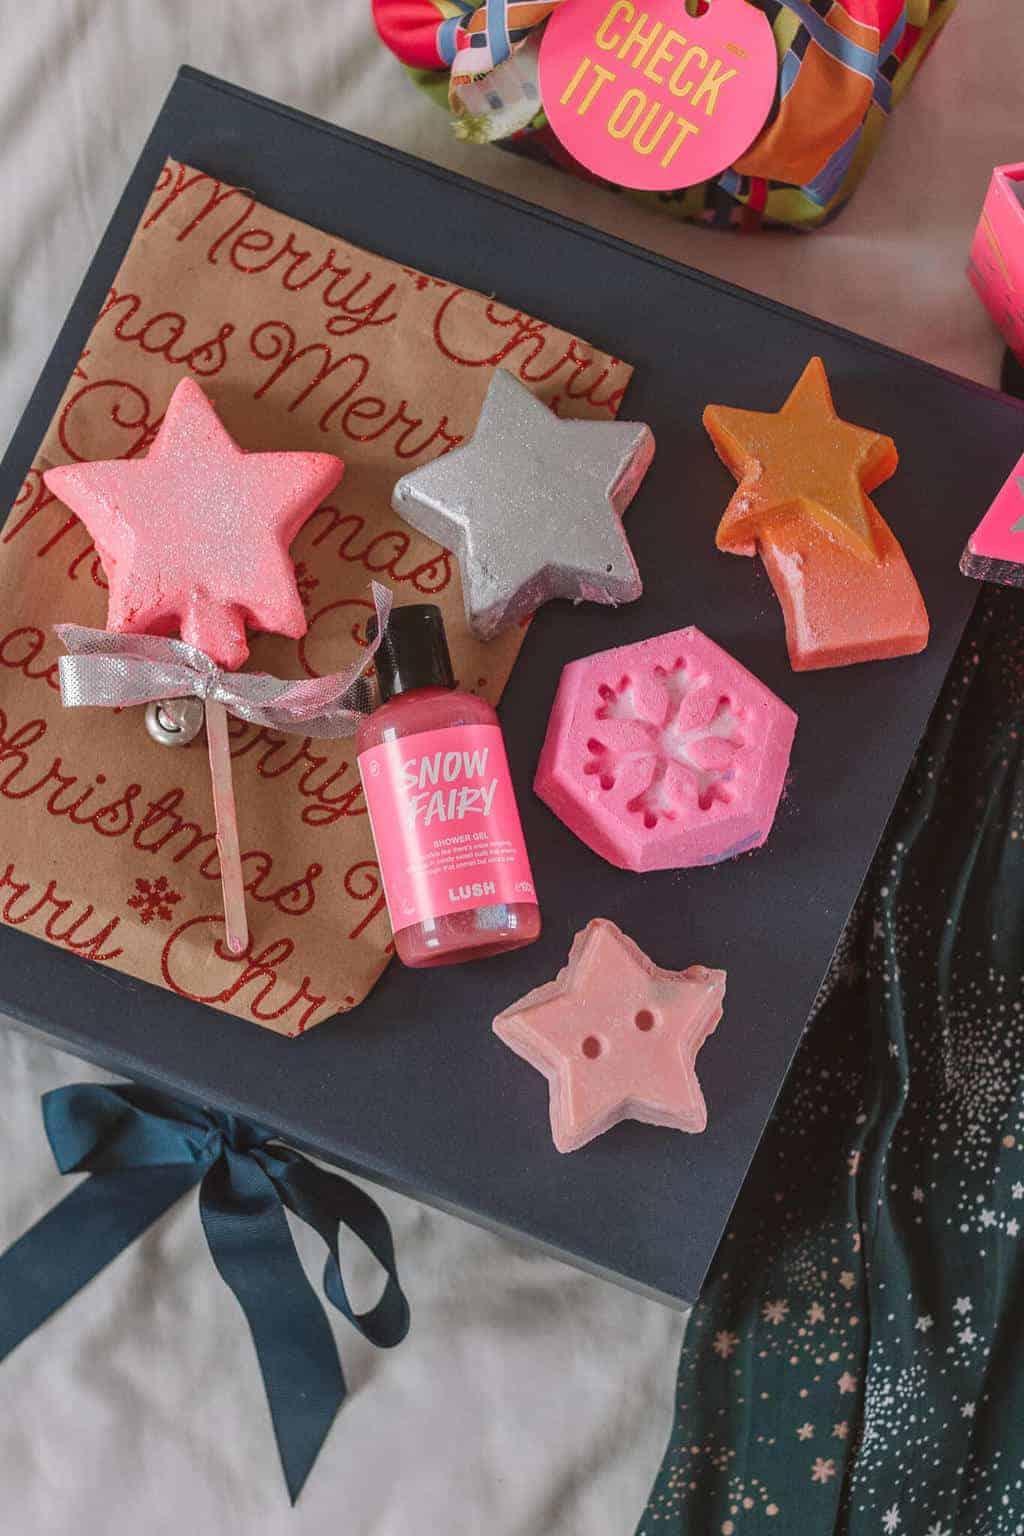 Lush - Christmas Gift Guide 2018: Brilliant Christmas Gift Ideas For Her #whatshotblog